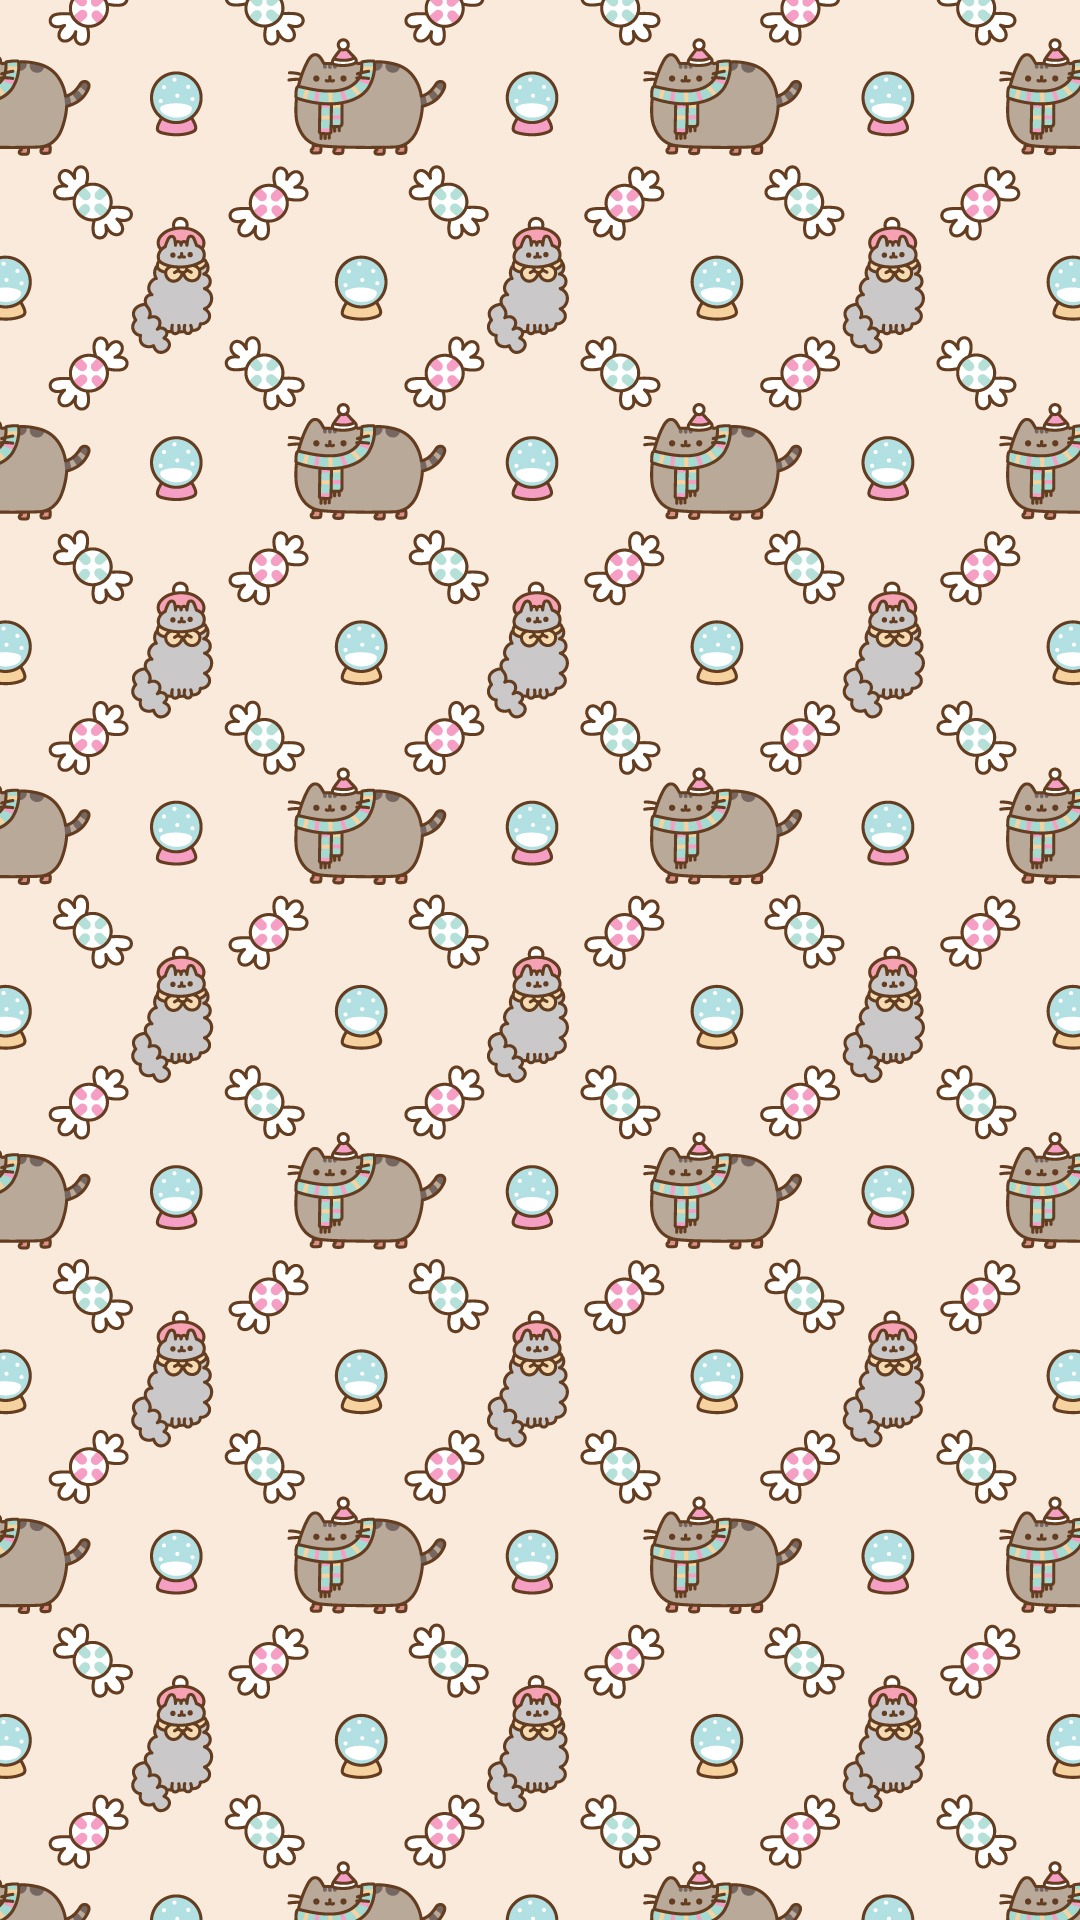 Pusheen Iphone Wallpaper Cute Free Christmas Pusheen Android And Iphone 174 Wallpapers